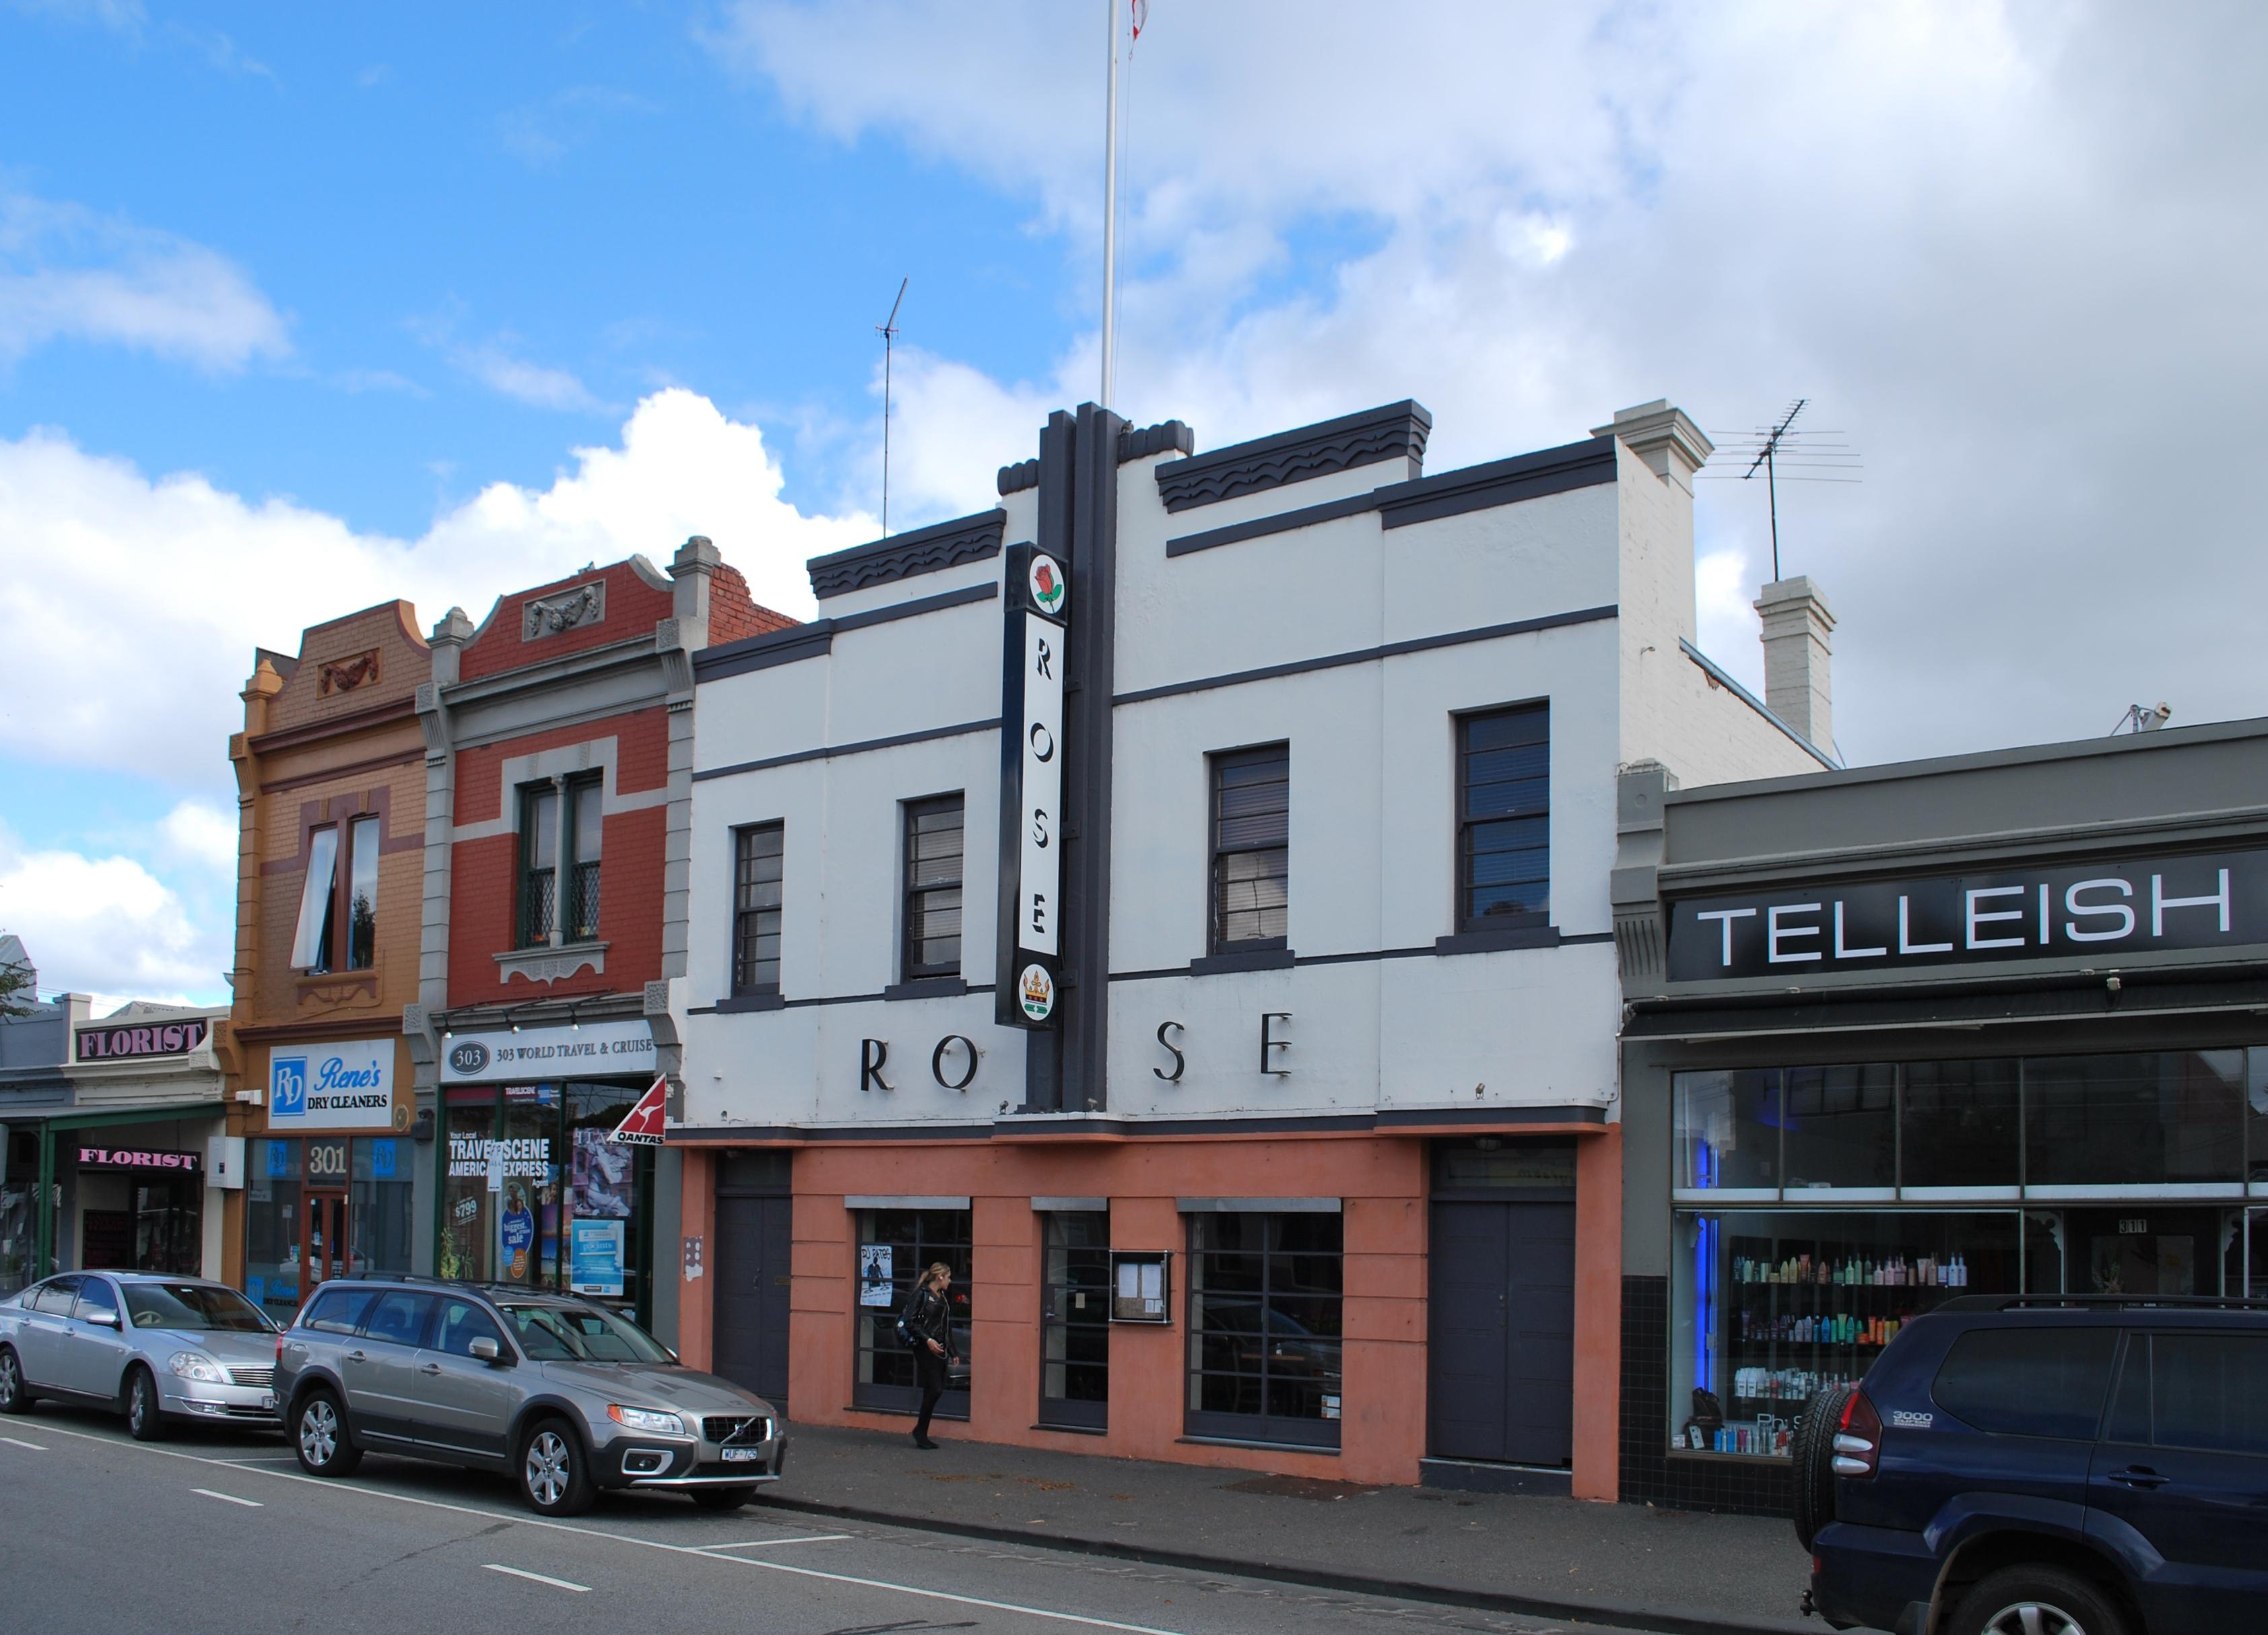 File:Port Melbourne Rose Hotel 001 JPG - Wikimedia Commons